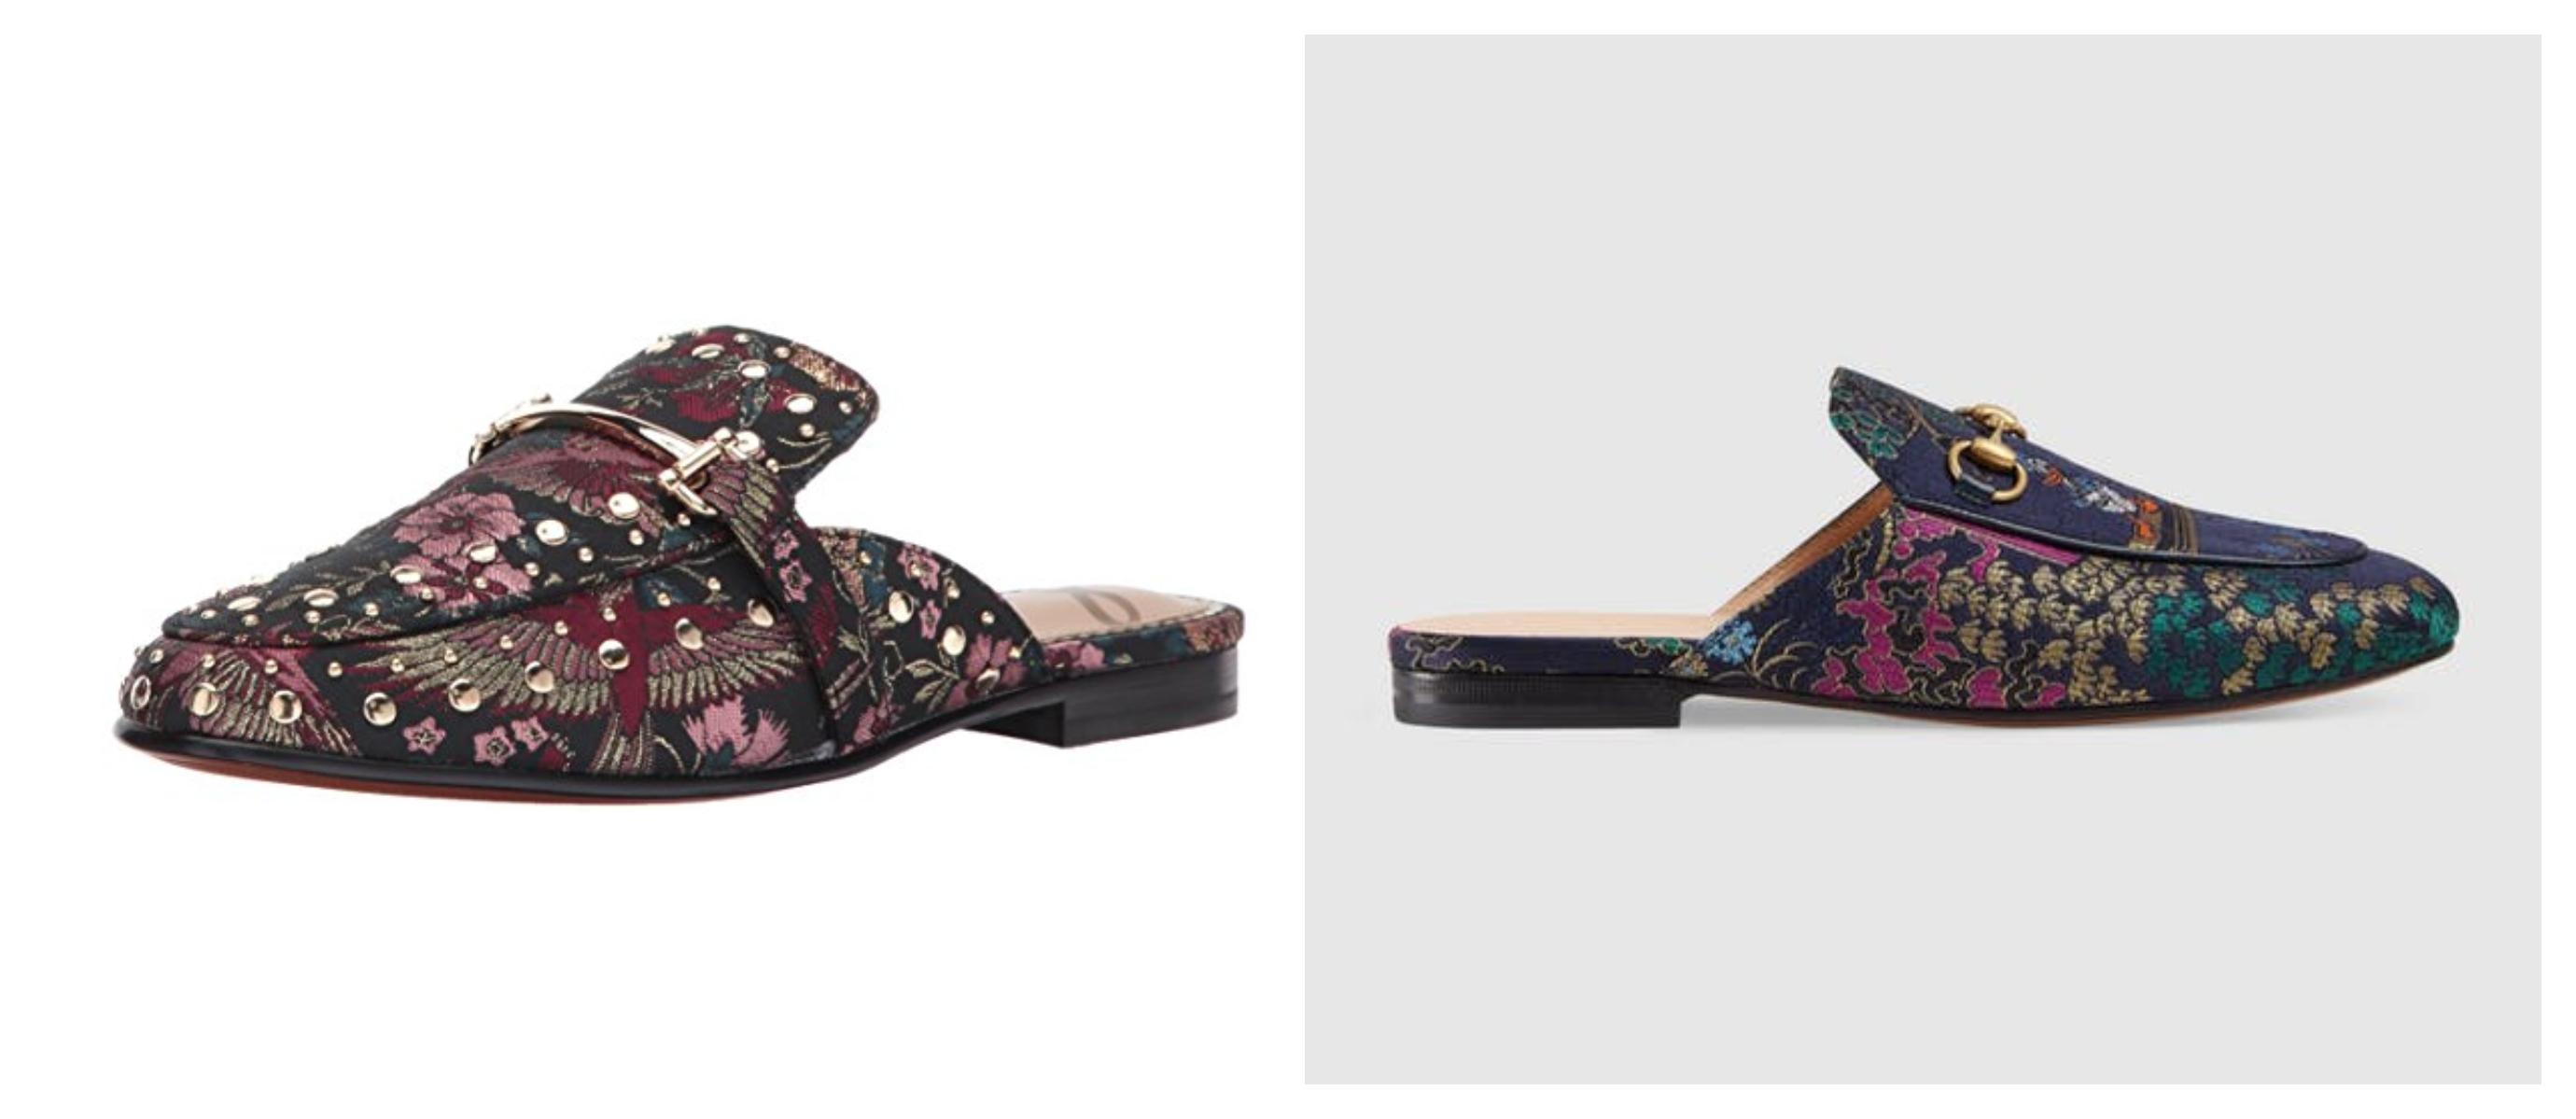 Jacquard Gucci slide dupe